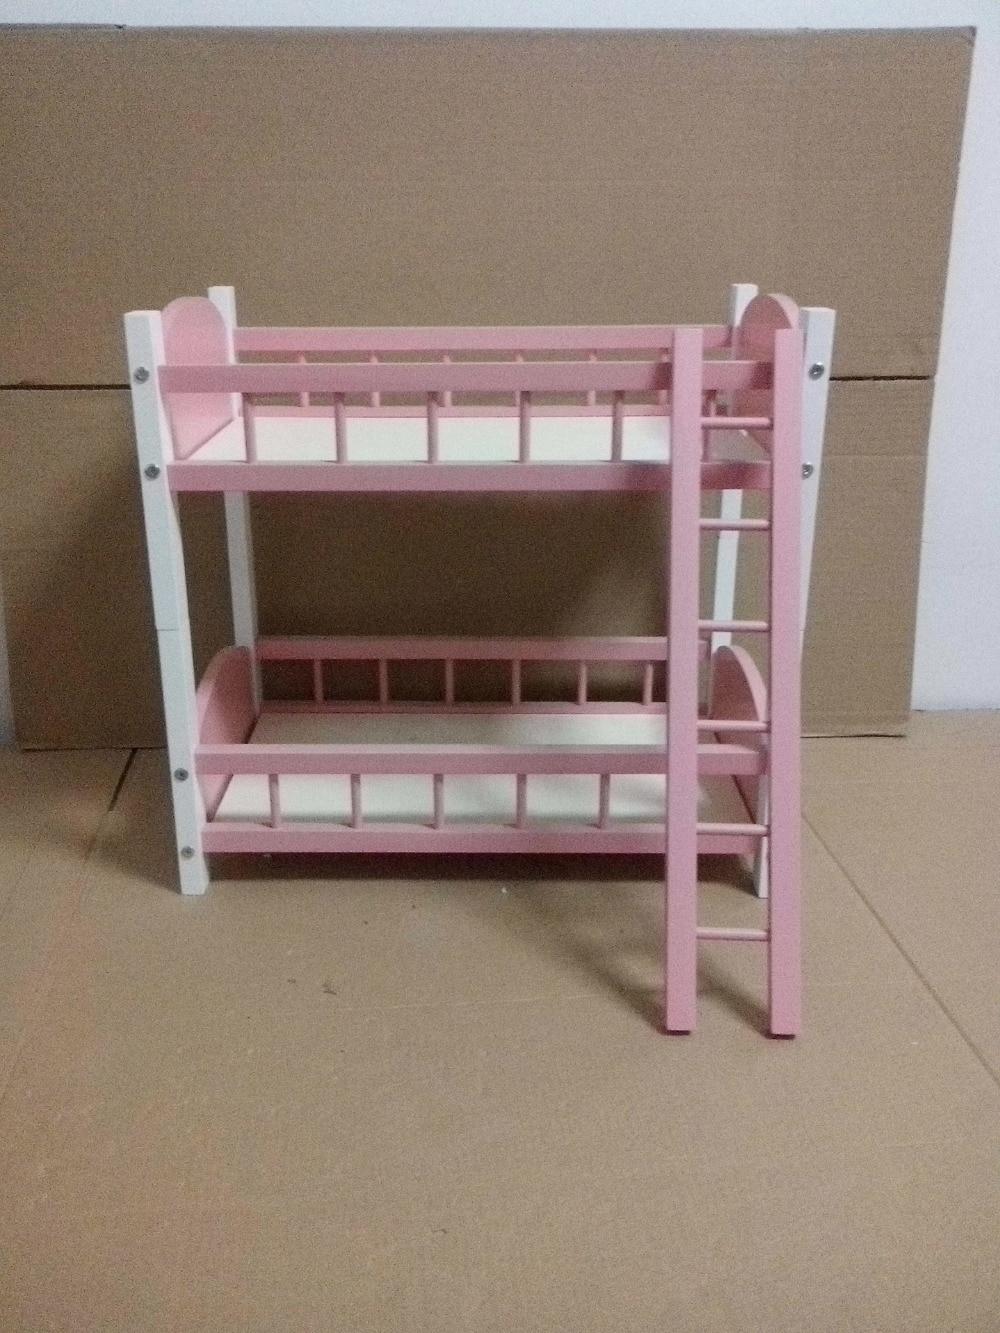 wamami ] 87# madera de color rosa cama / cama litera marco de dos ...